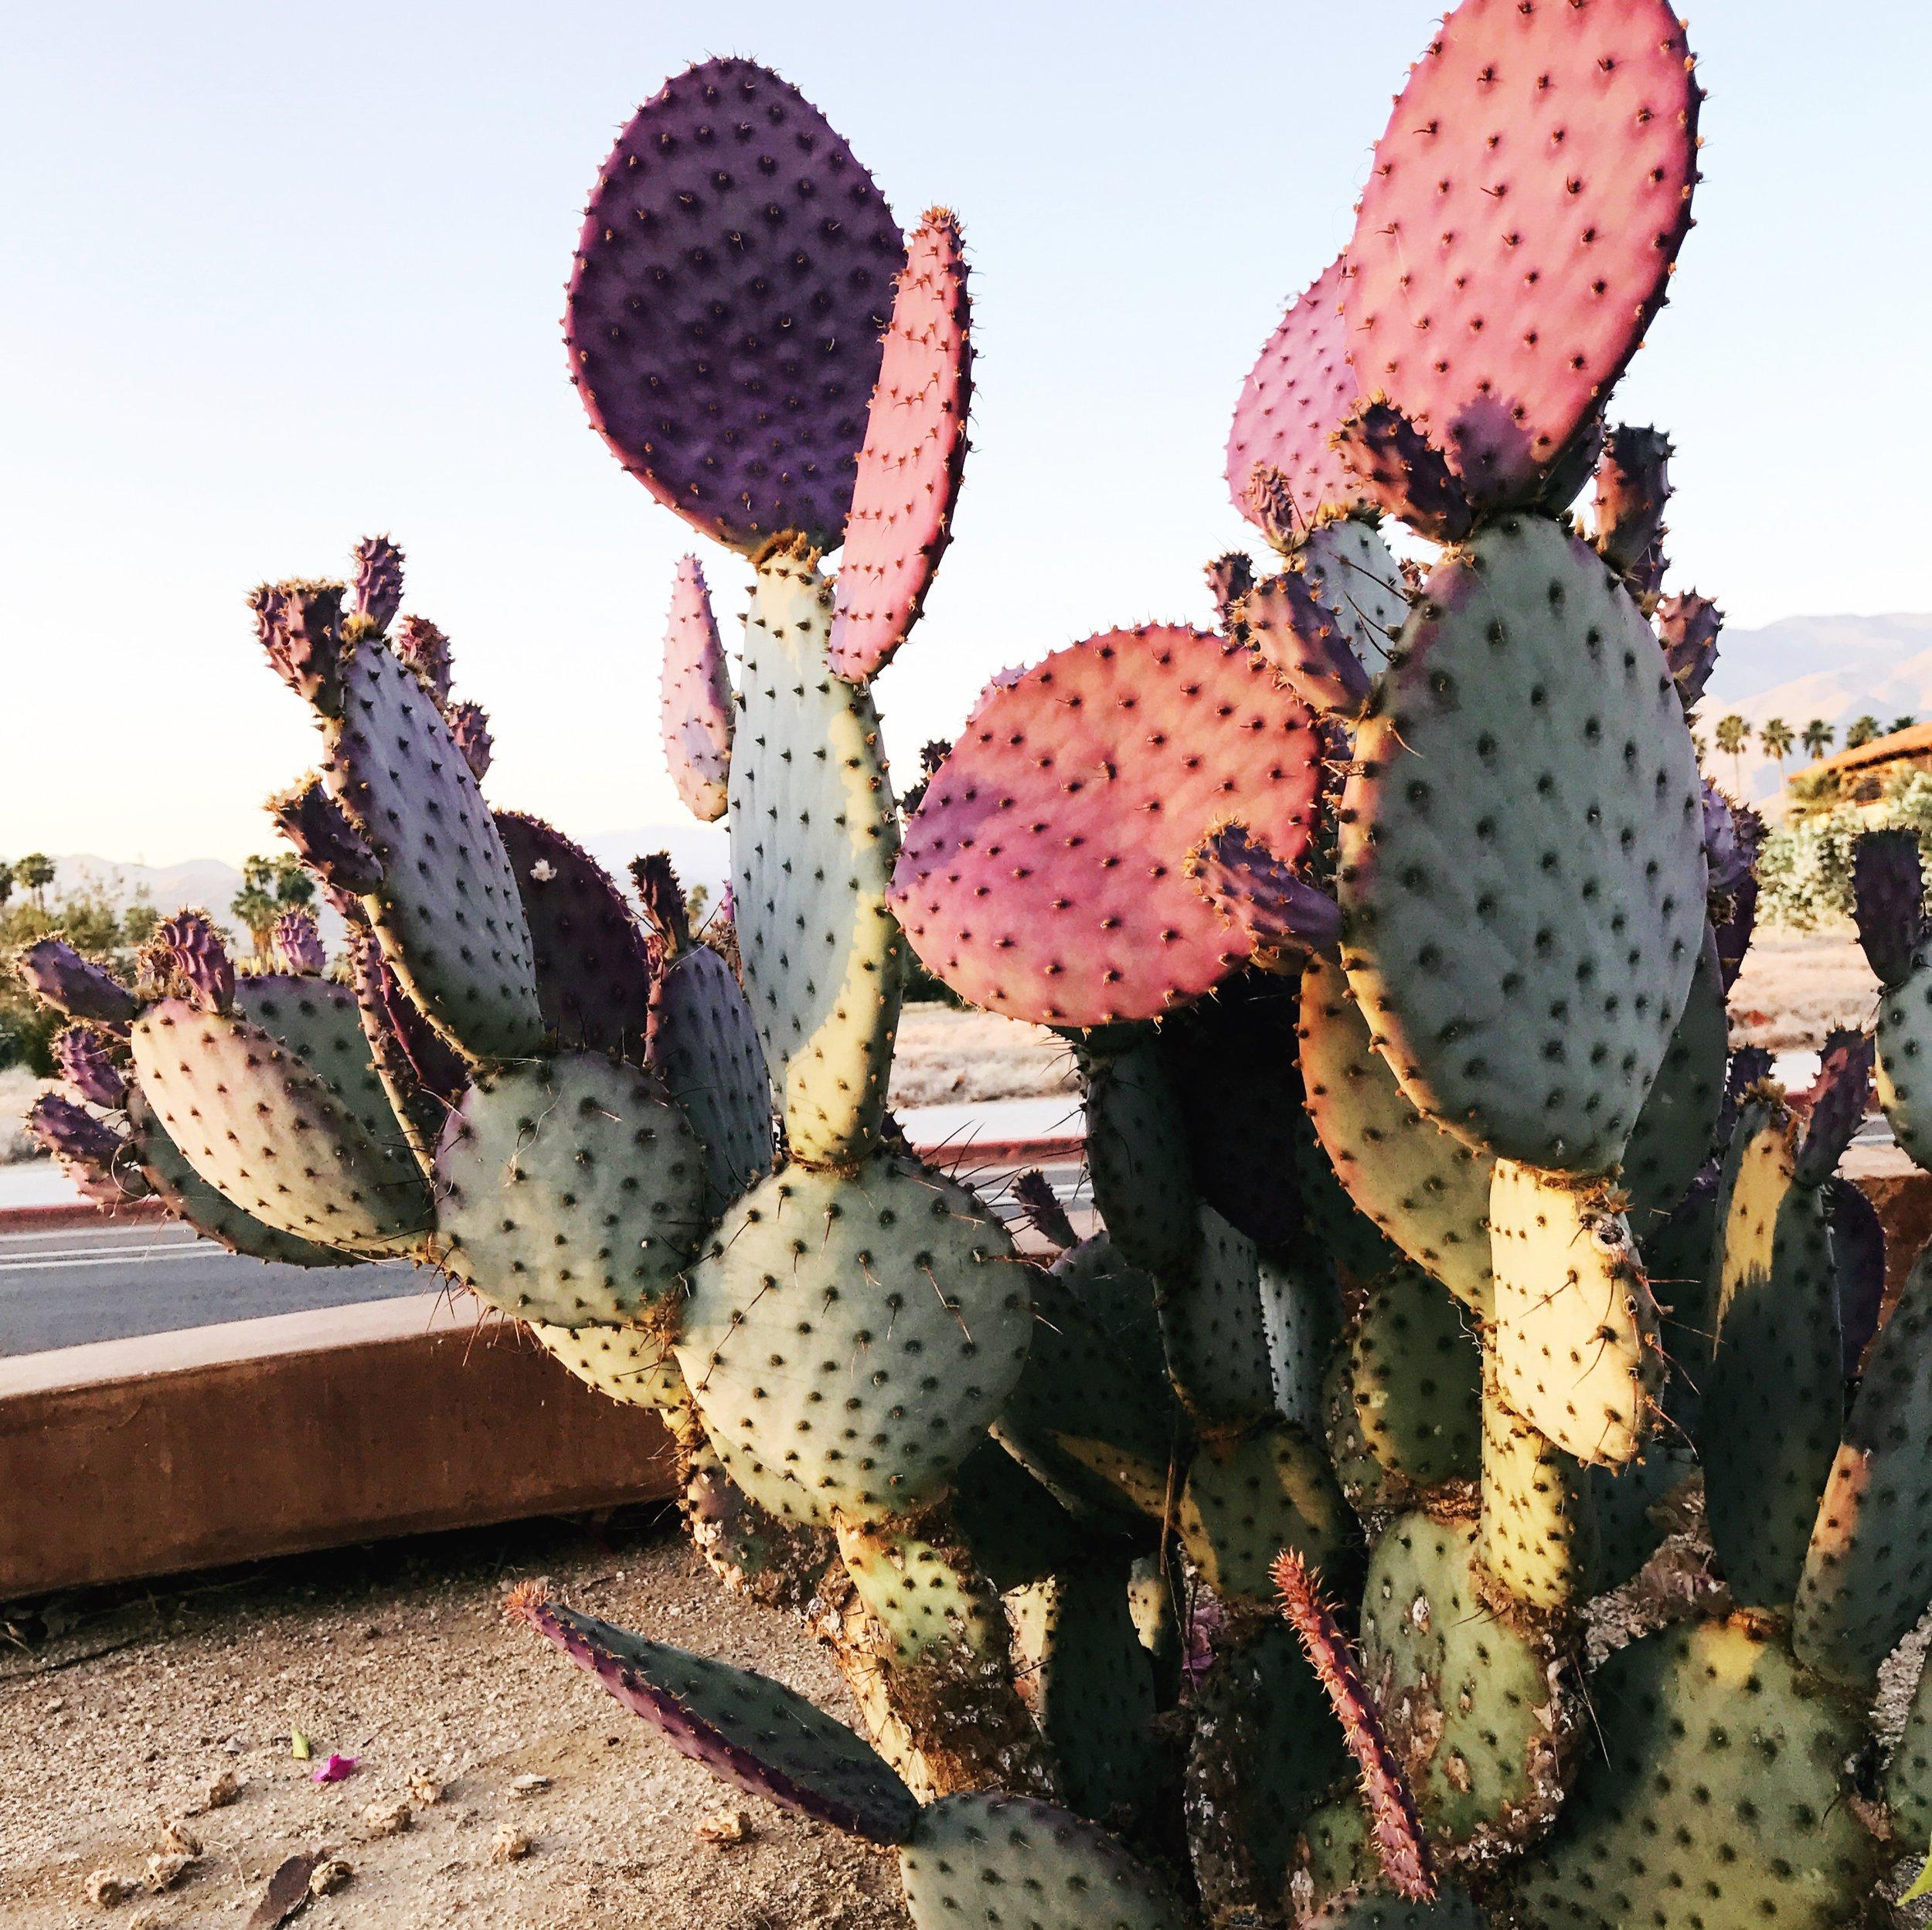 pink_cactus.JPG